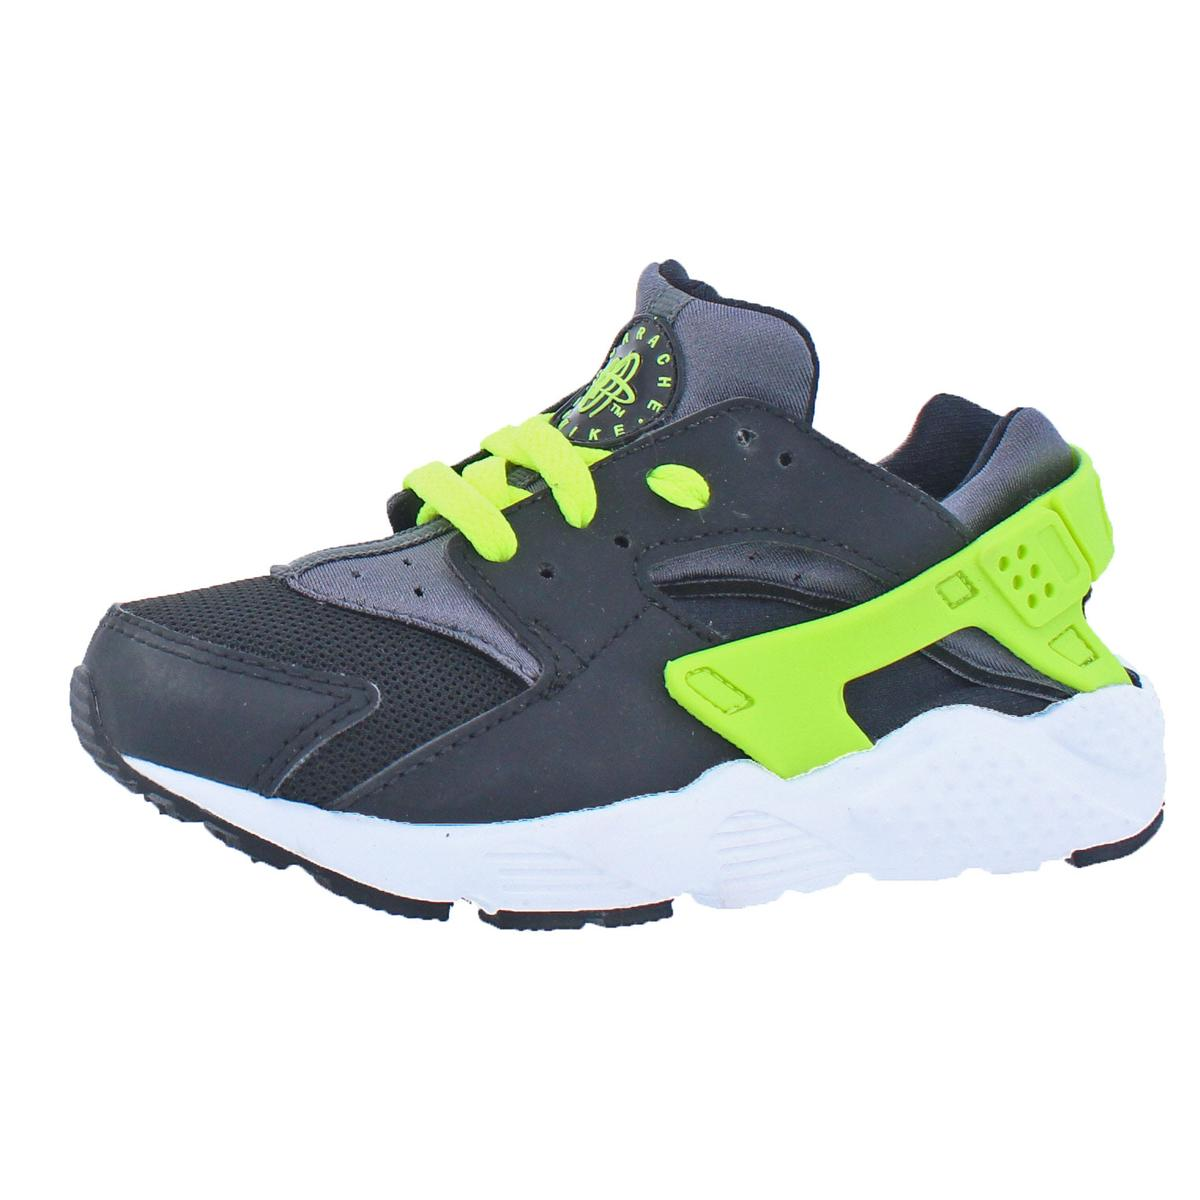 new arrival f8cfc daa9b Nike Huarache Run Boys Little Kid Fashion Running Shoes